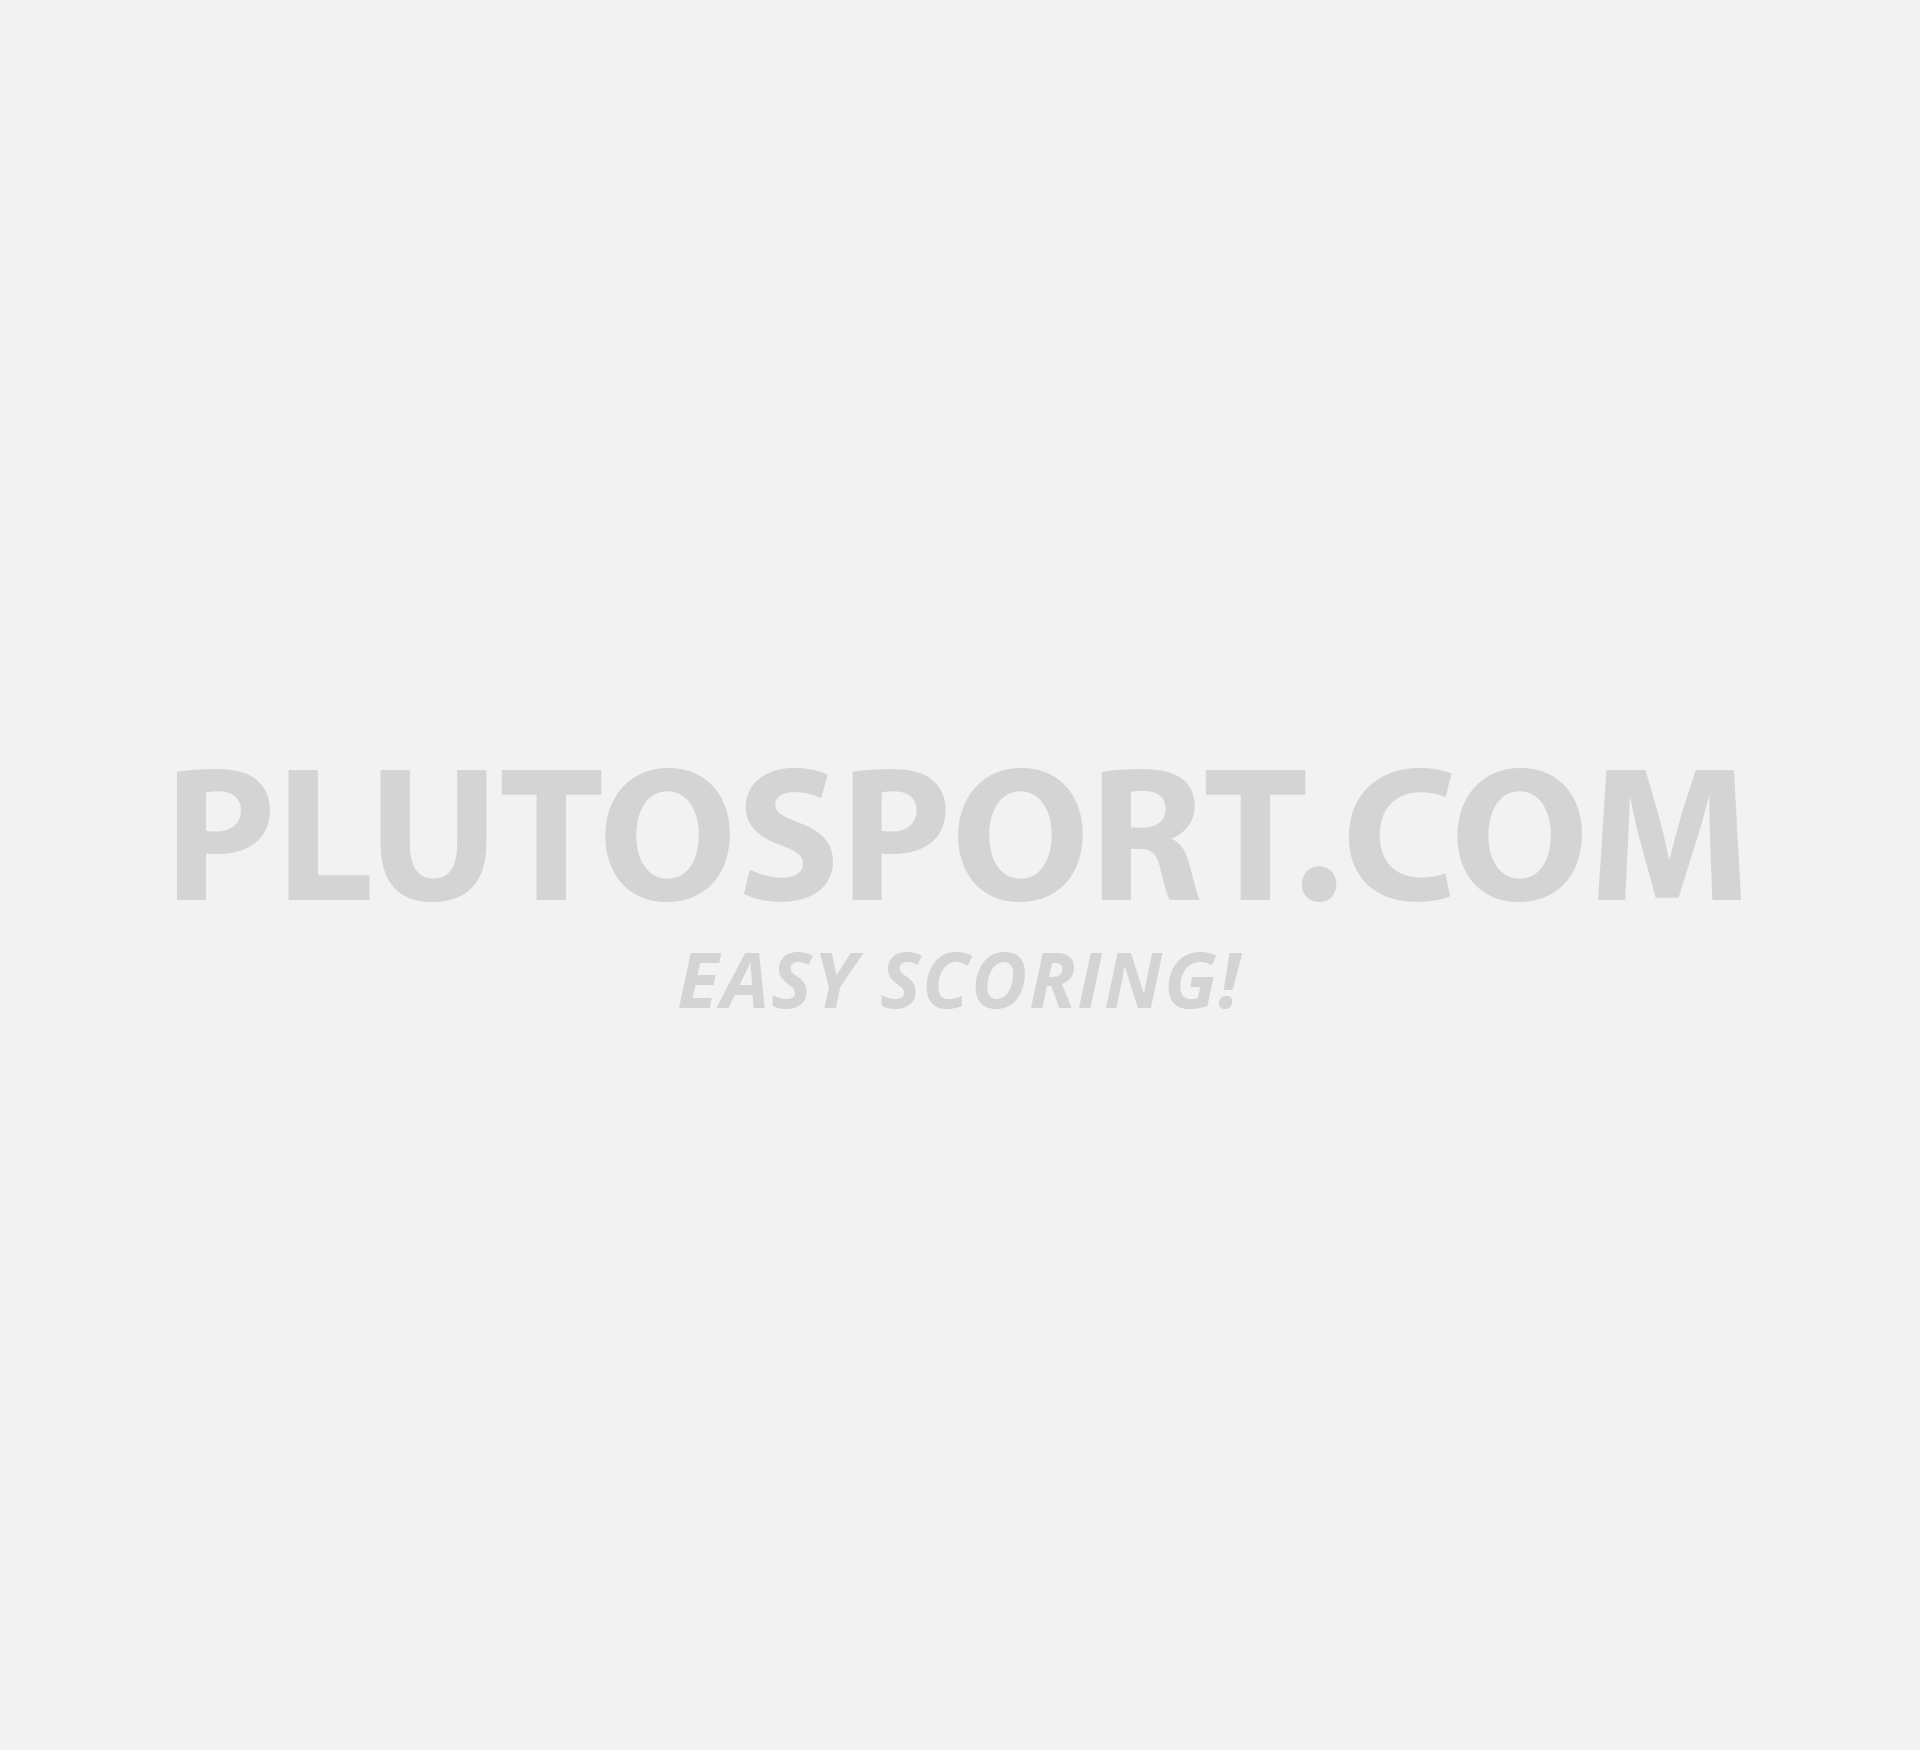 35bd6c90 Mizuno Premium High-Kyu Tee - Shirts - Clothing - Korfball - Sports    Plutosport